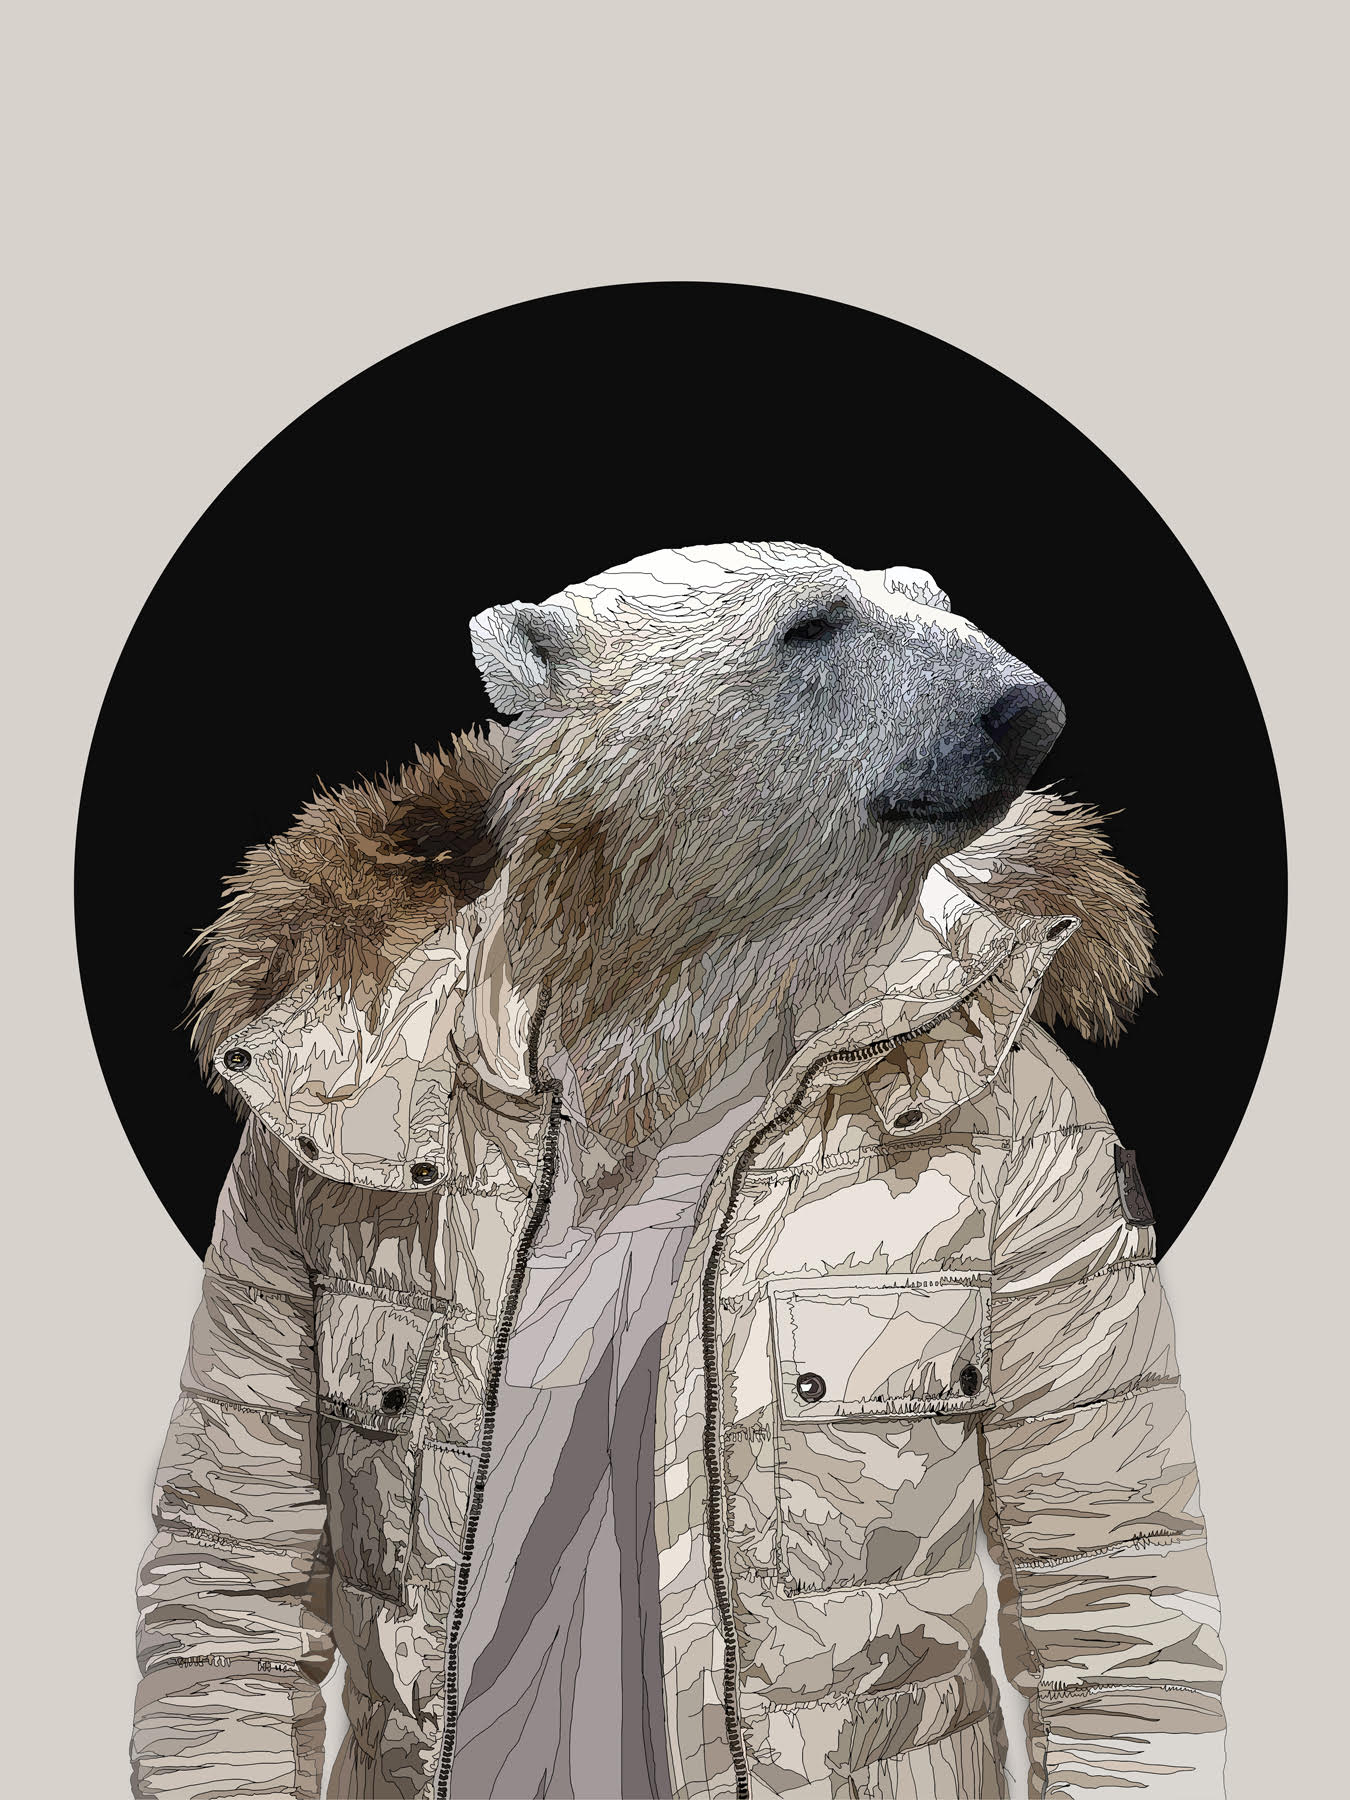 Stay Cool, 2017 | Digital print on perspex | 60 x 80 cm | £850